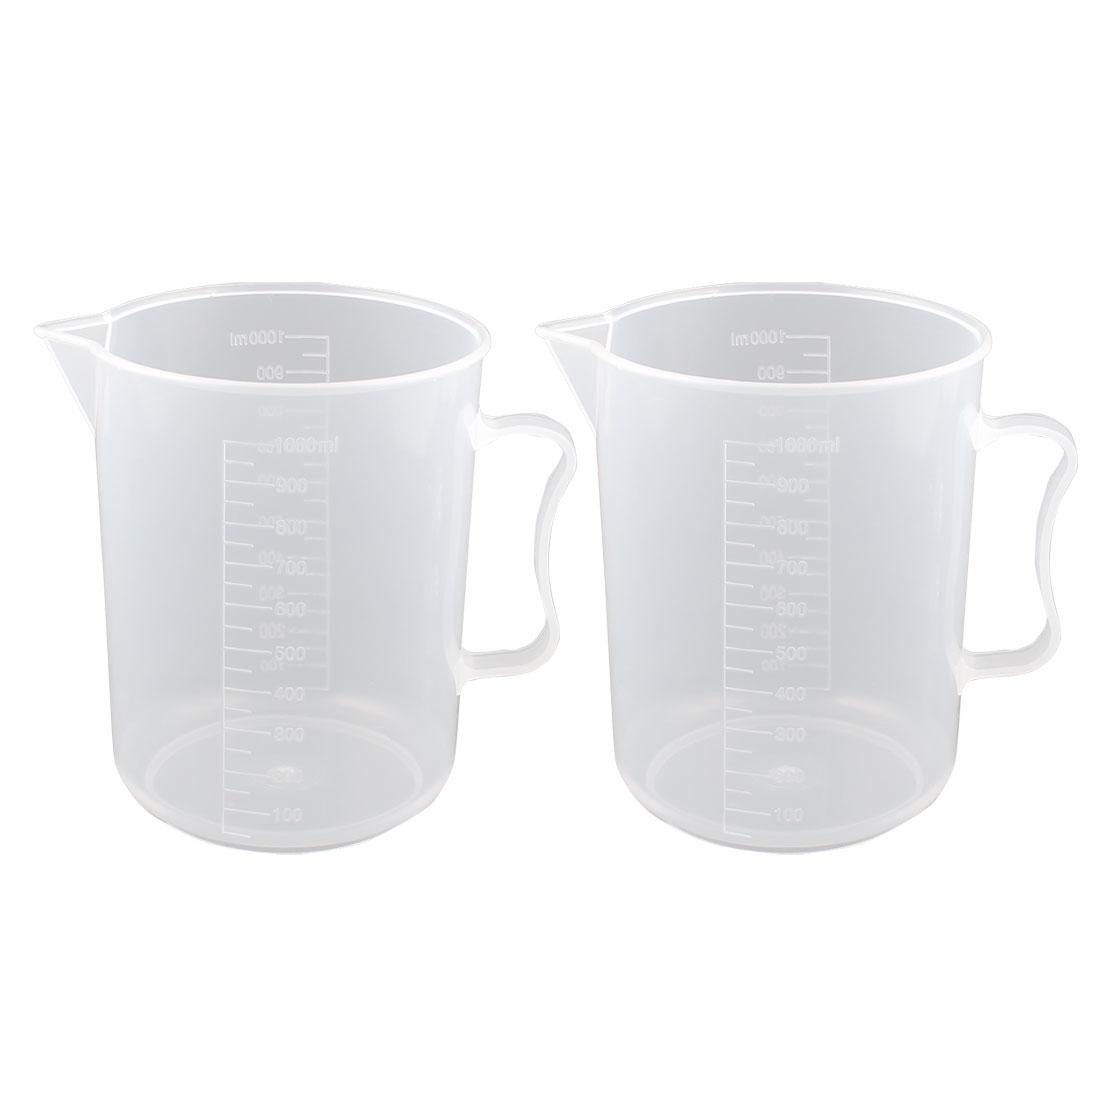 1000ml Plastic Laboratory Chemistry Transparent Measuring Cup Handle Design Cup Beaker 2 Pcs